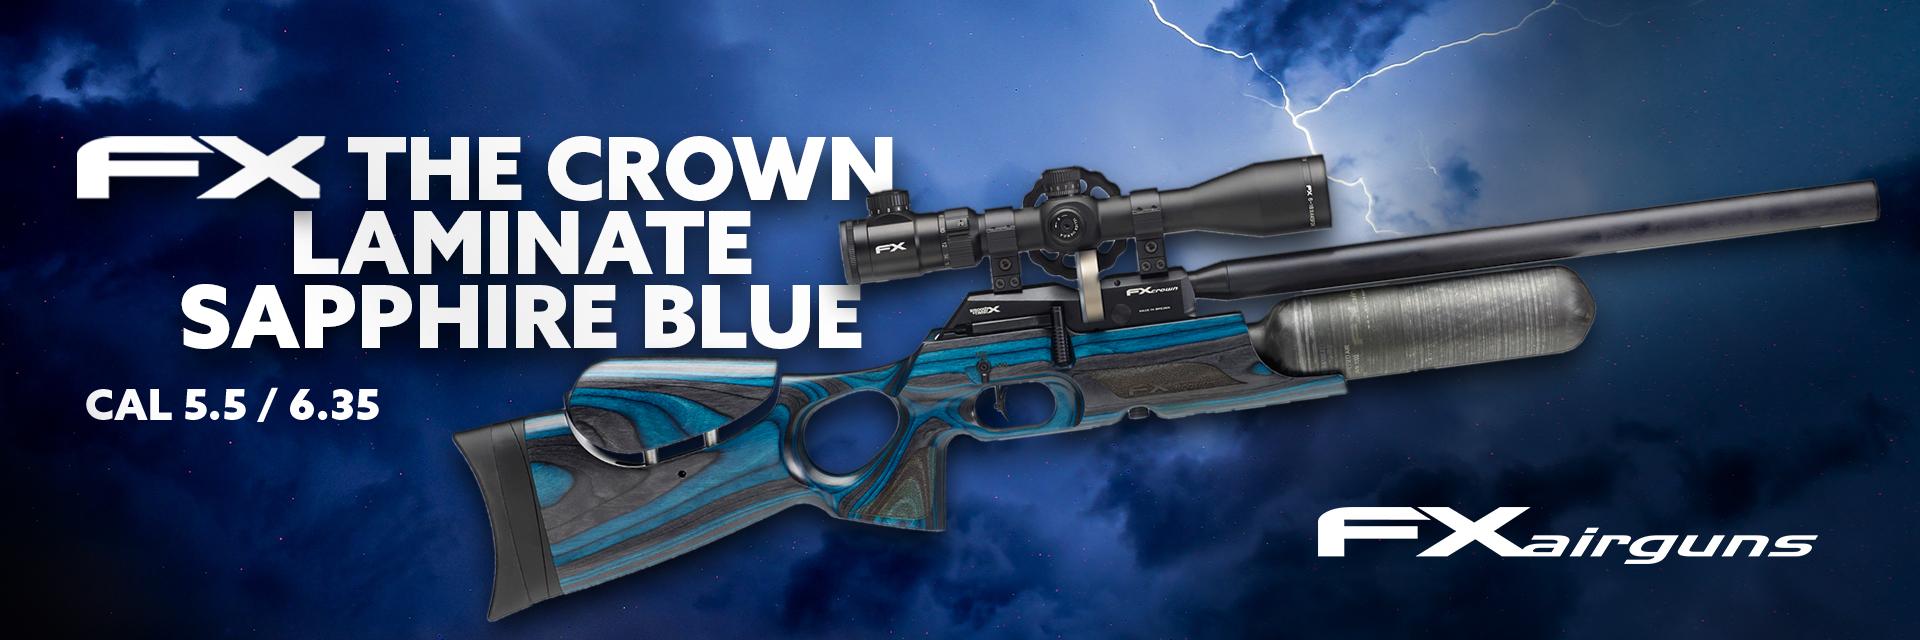 FX SAPPHIRE BLUE